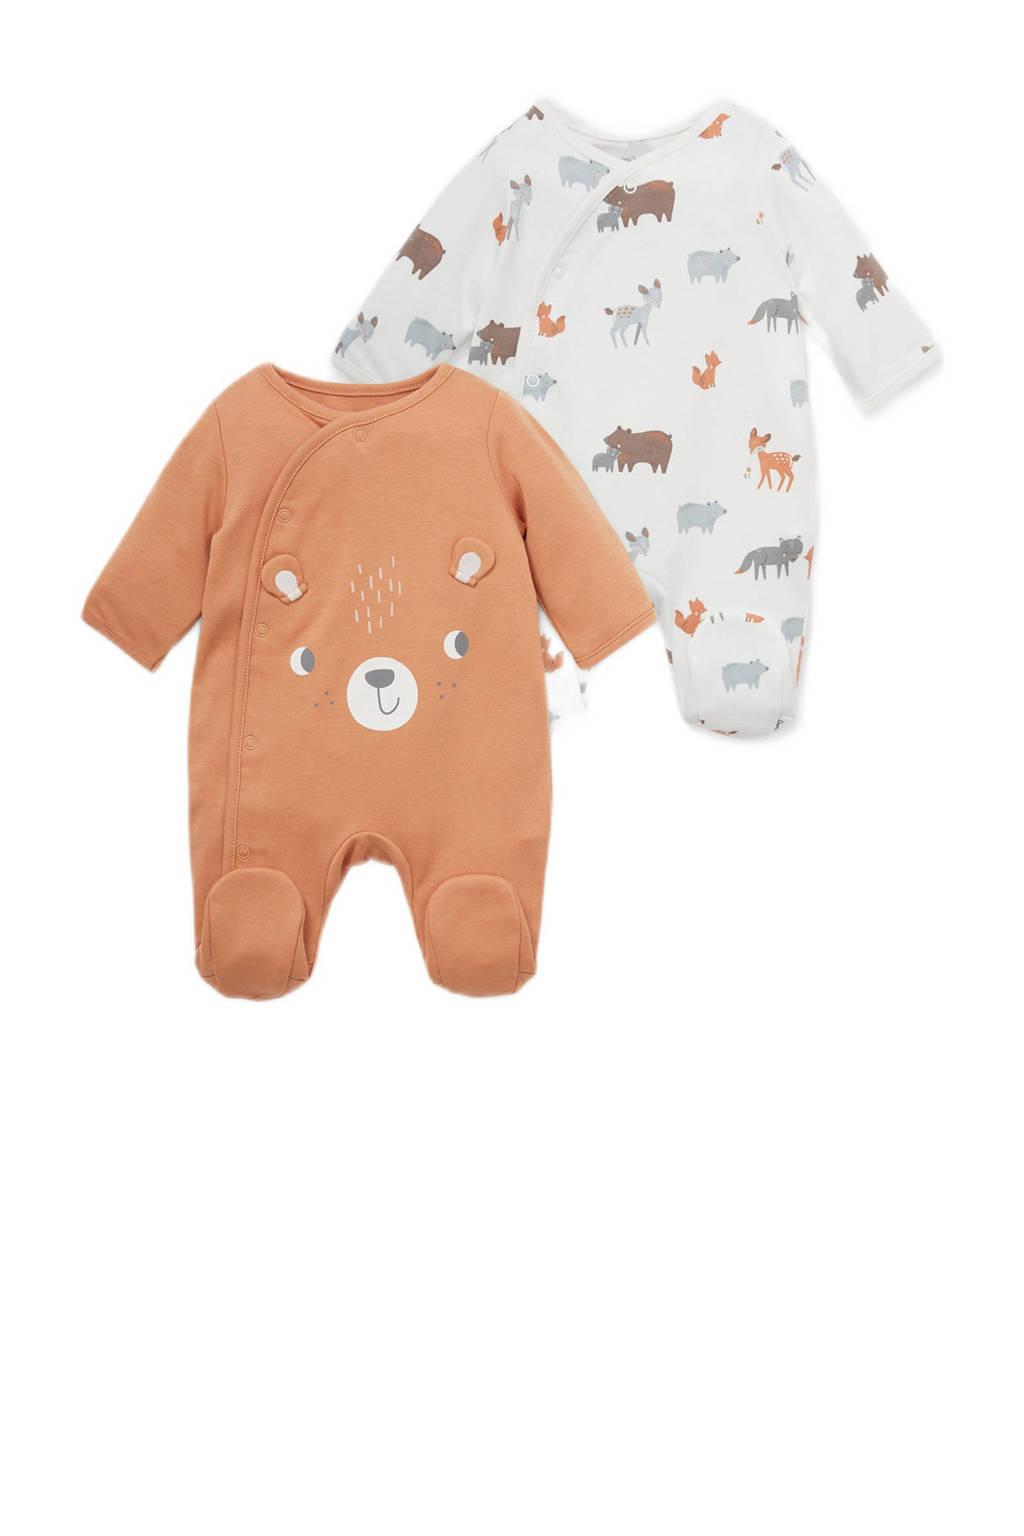 C&A Baby Newborn newborn boxpak - set van 2 oranje/wit, Terra/wit